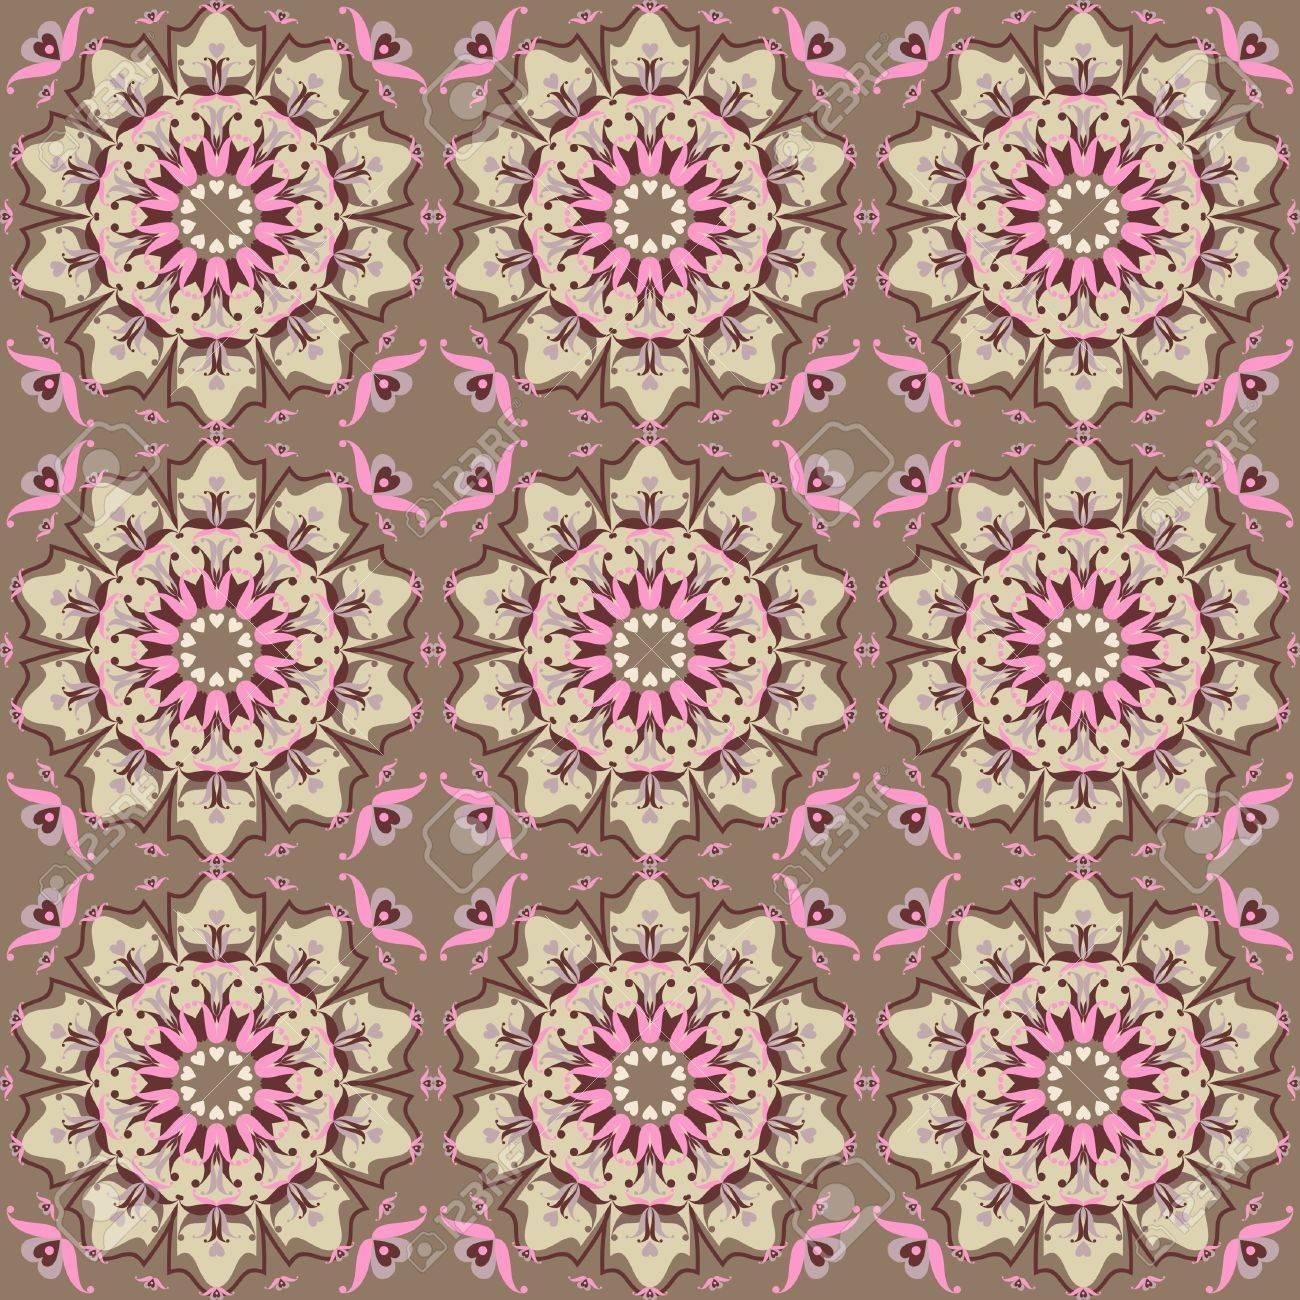 Oriental floral ornamental carpet design royalty free cliparts oriental floral ornamental carpet design stock vector 13621107 baanklon Choice Image